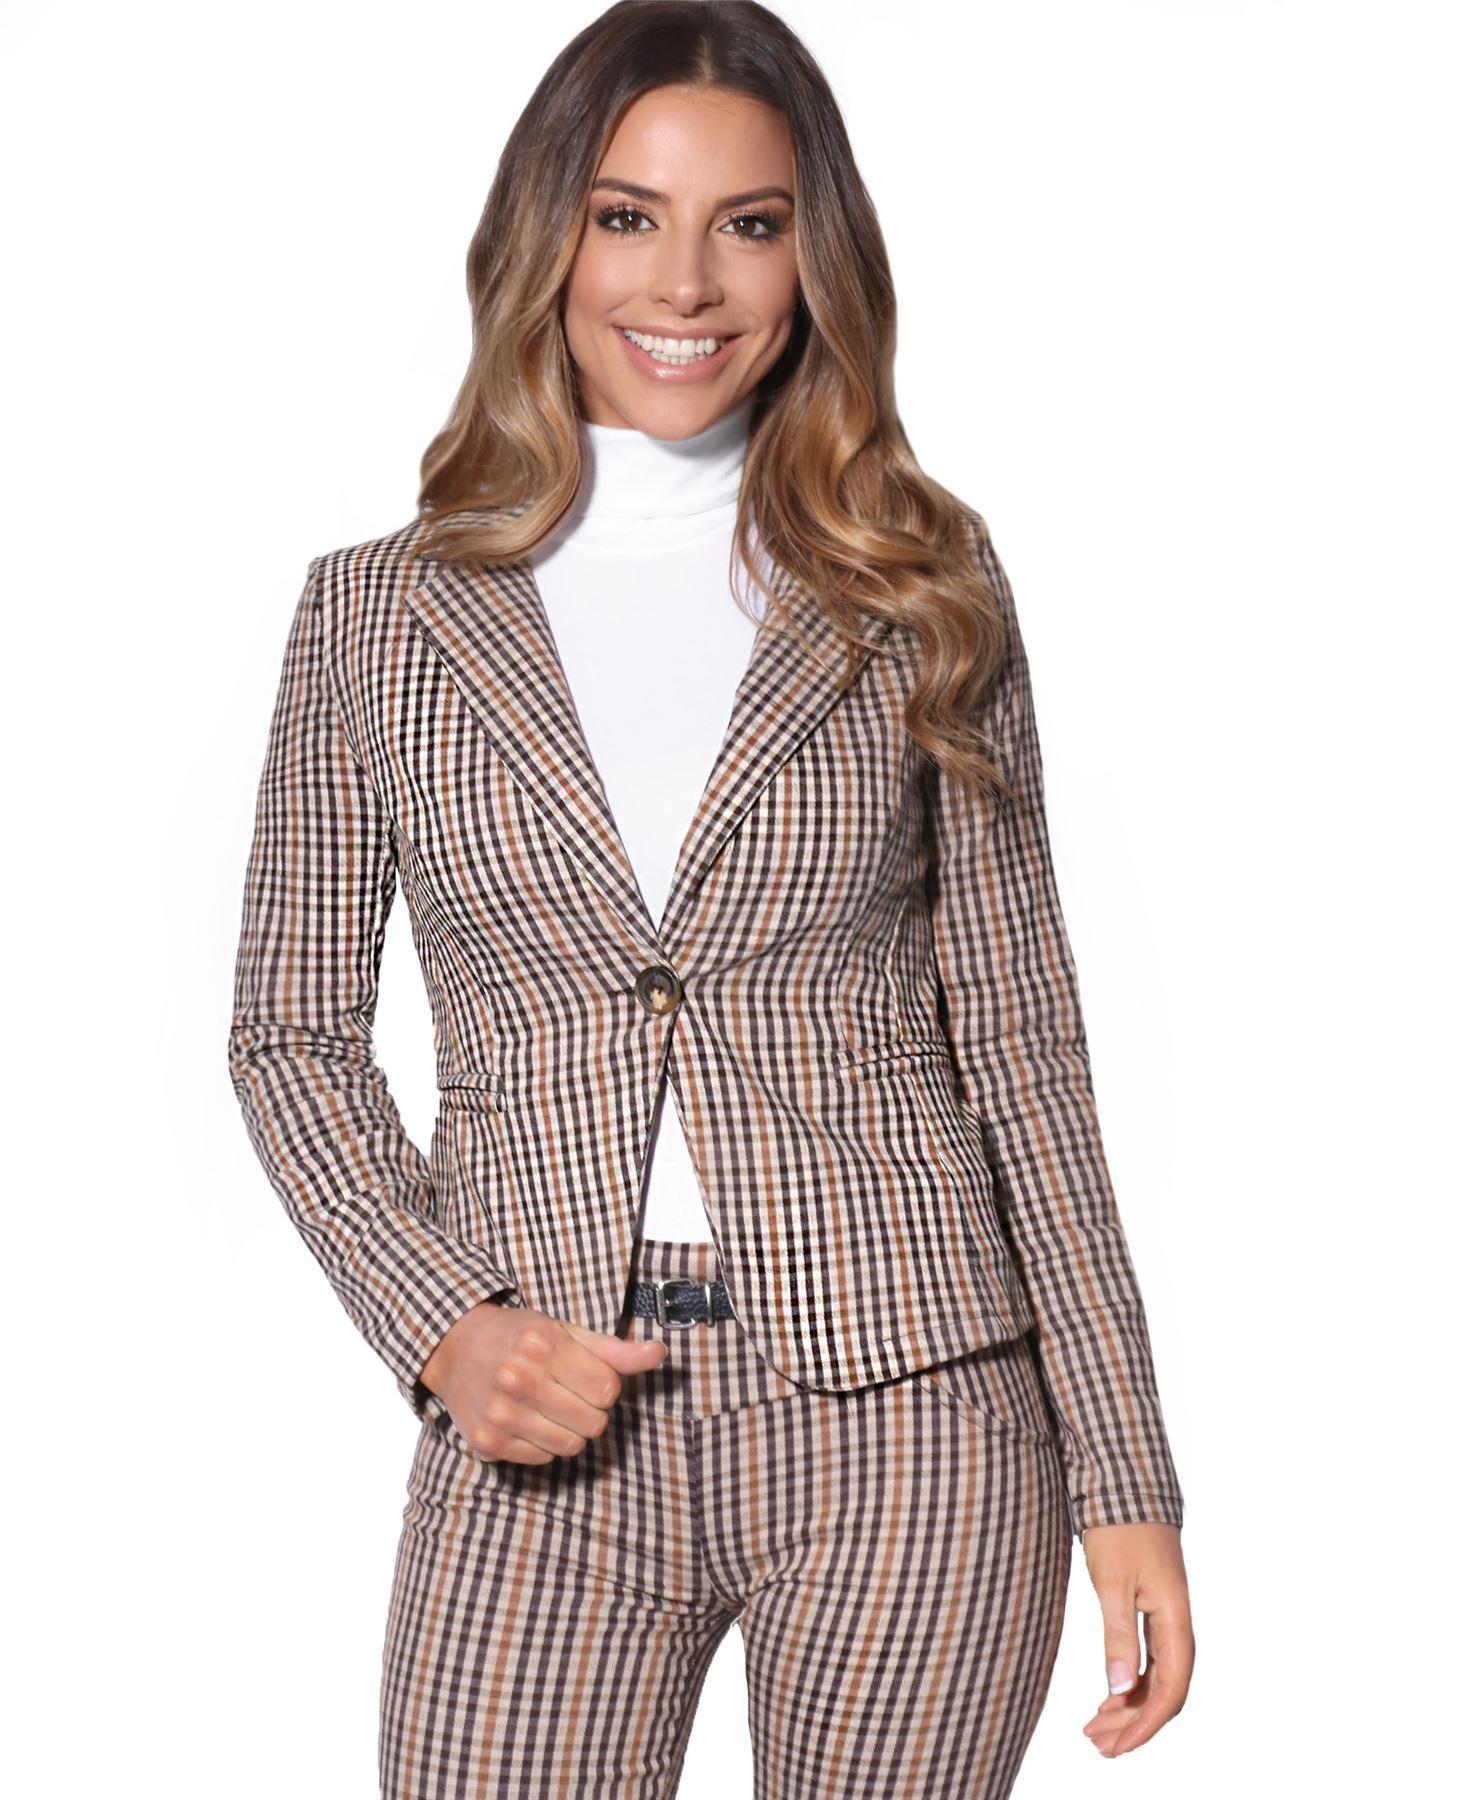 Blazers Box Office: Womens Check Work Suit Woven Office Blazer Jacket Stretch